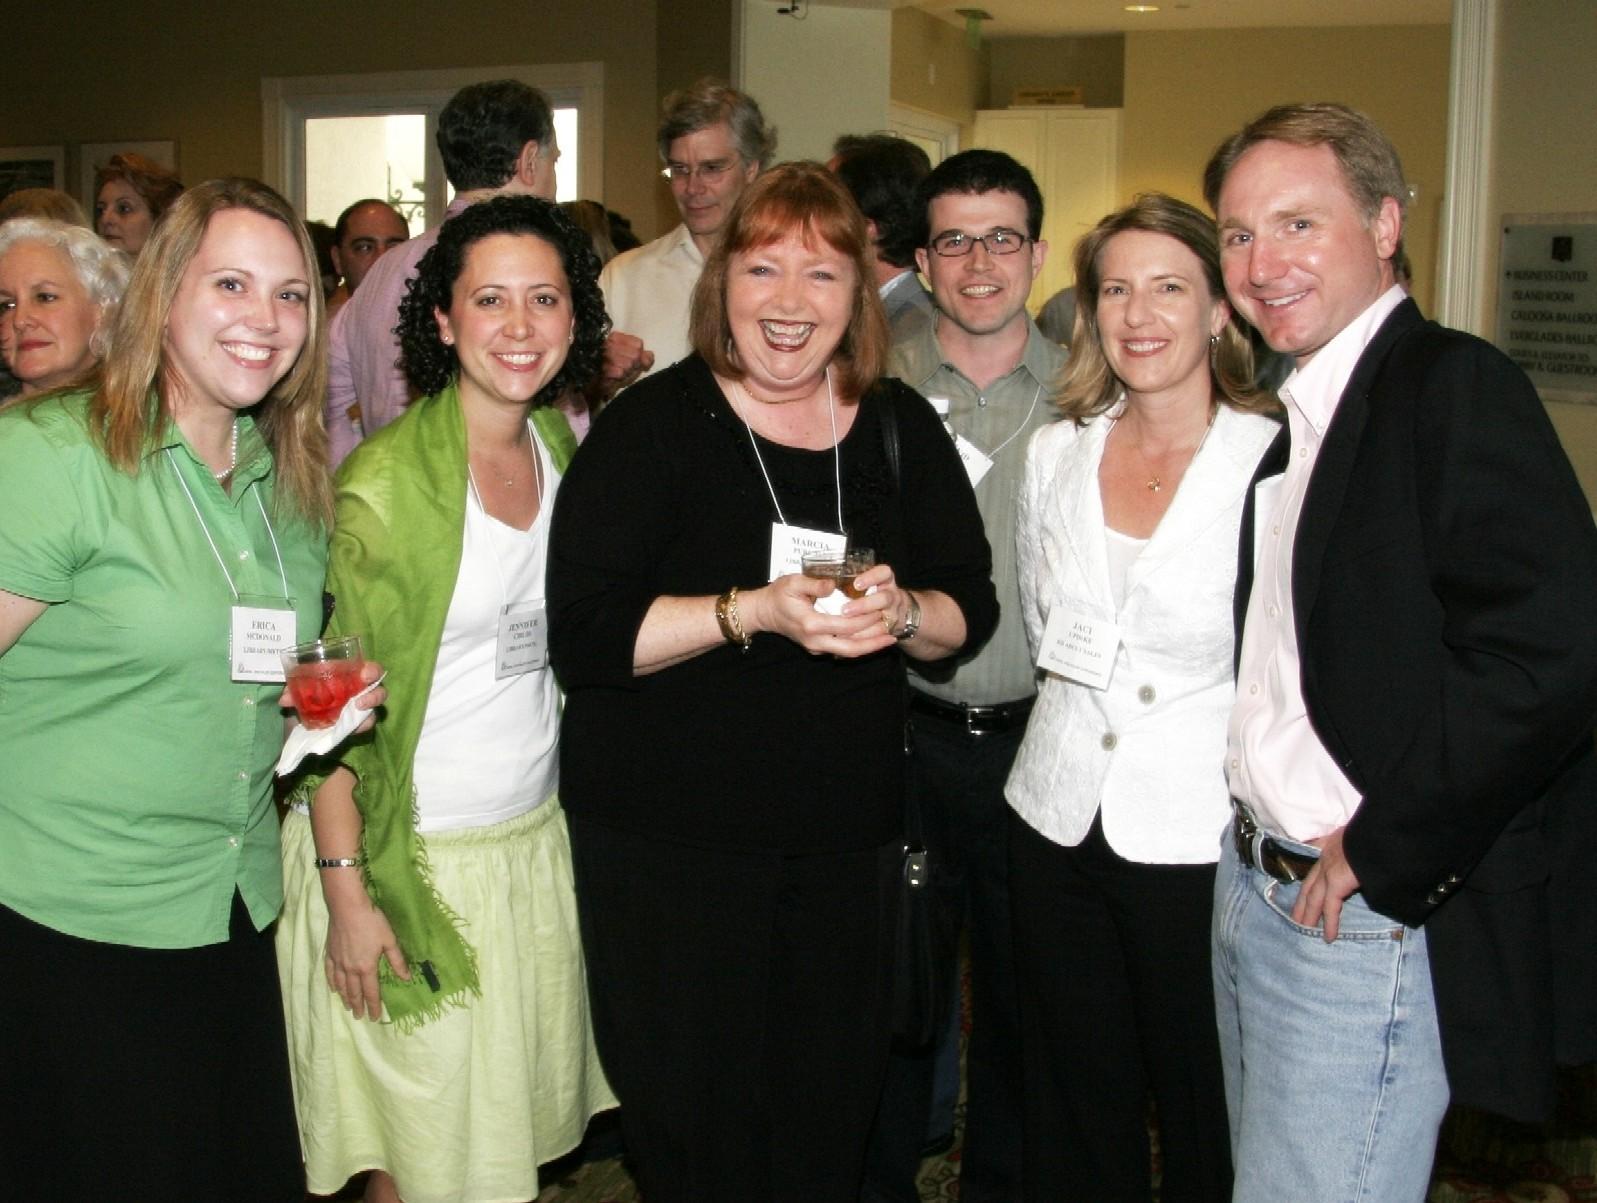 dan-brown-sales-conference-2006jpg2